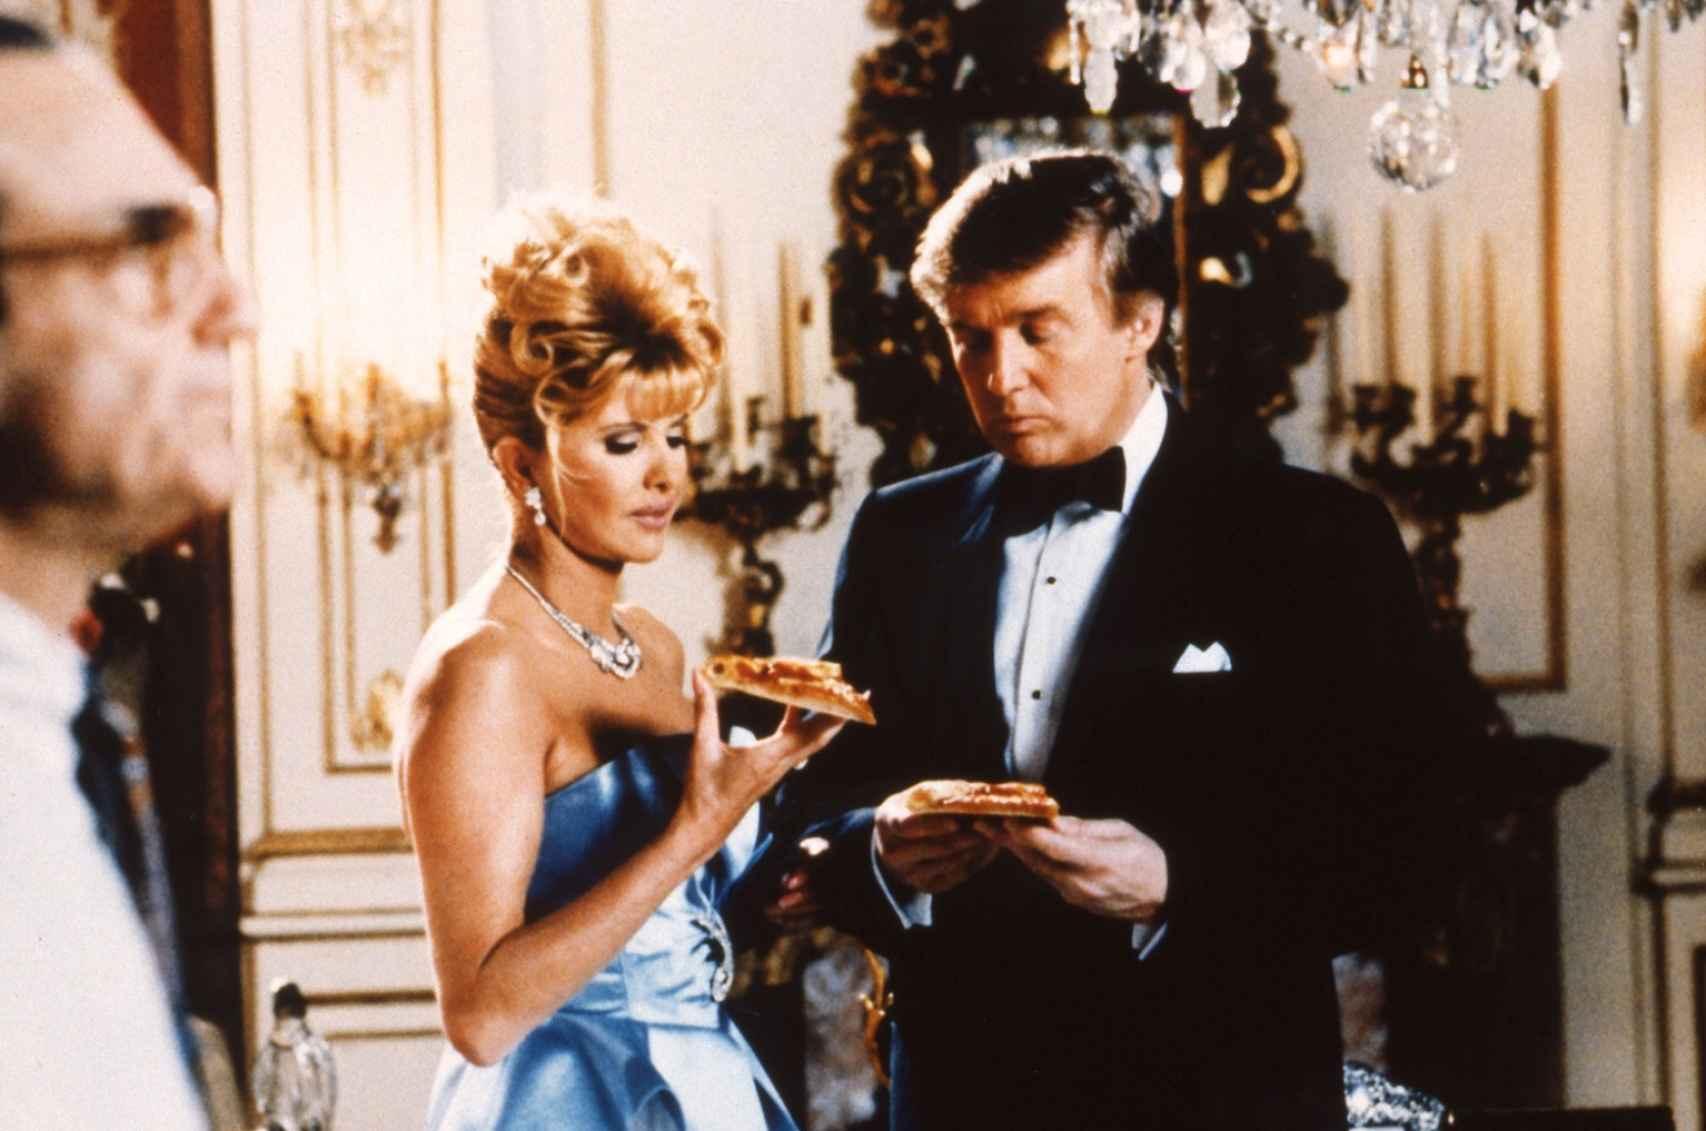 Trump en un anuncio de Pizza Hut junto a su primera esposa, Ivana.